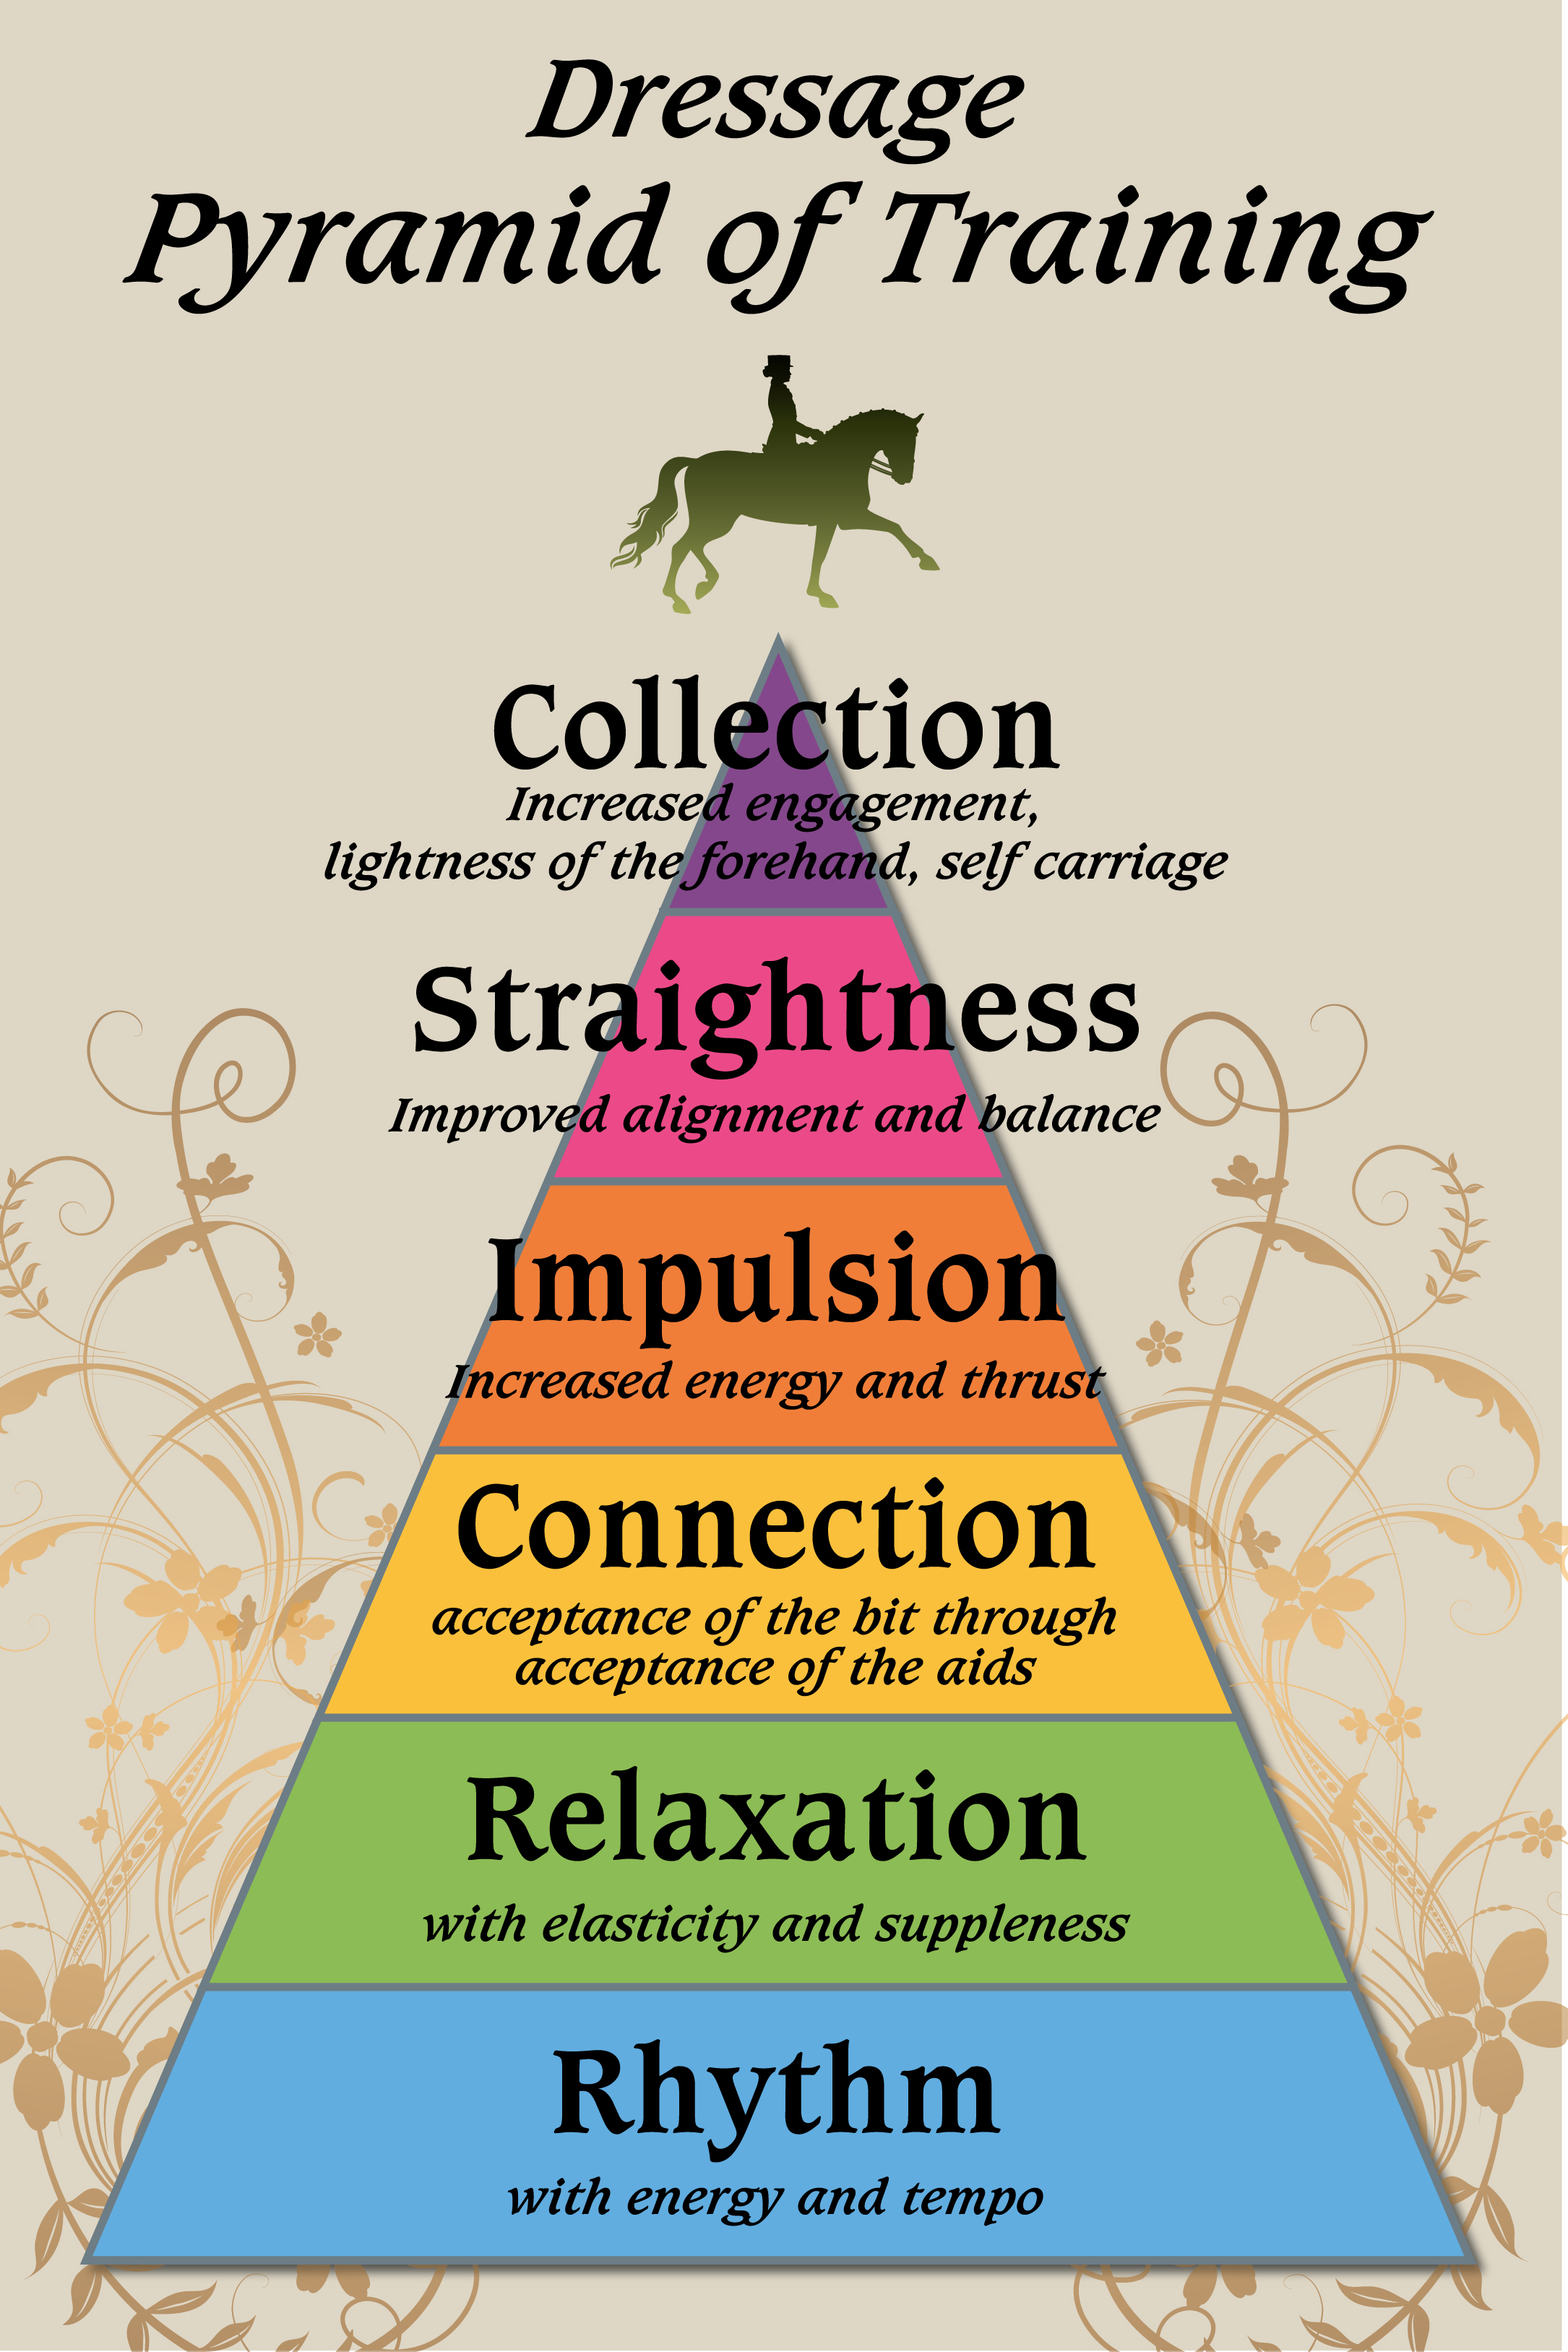 Poster-Training-Pyramid.jpg